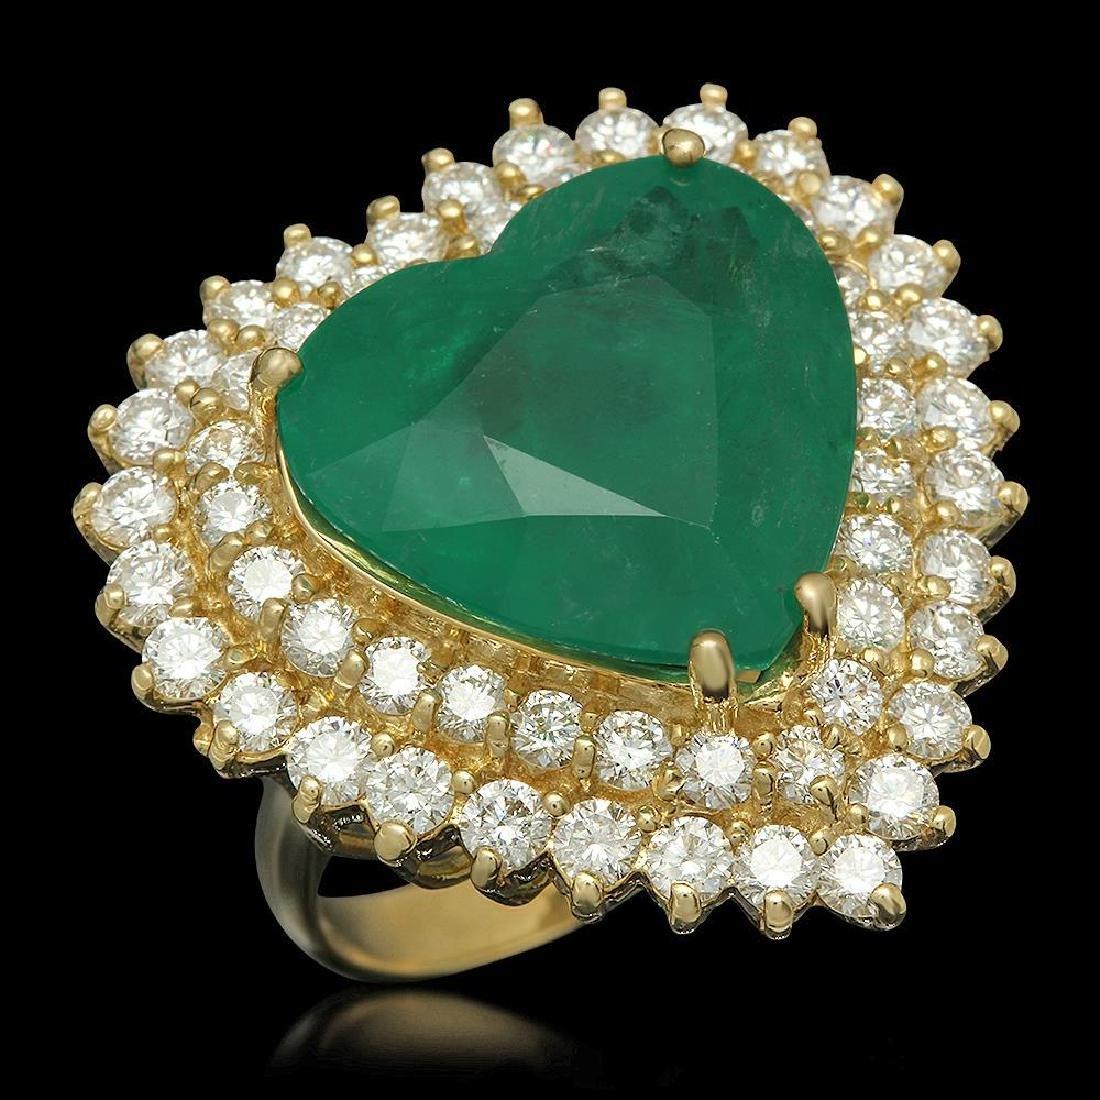 14K Gold 11.09ct Emerald 2.83ct Diamond Ring